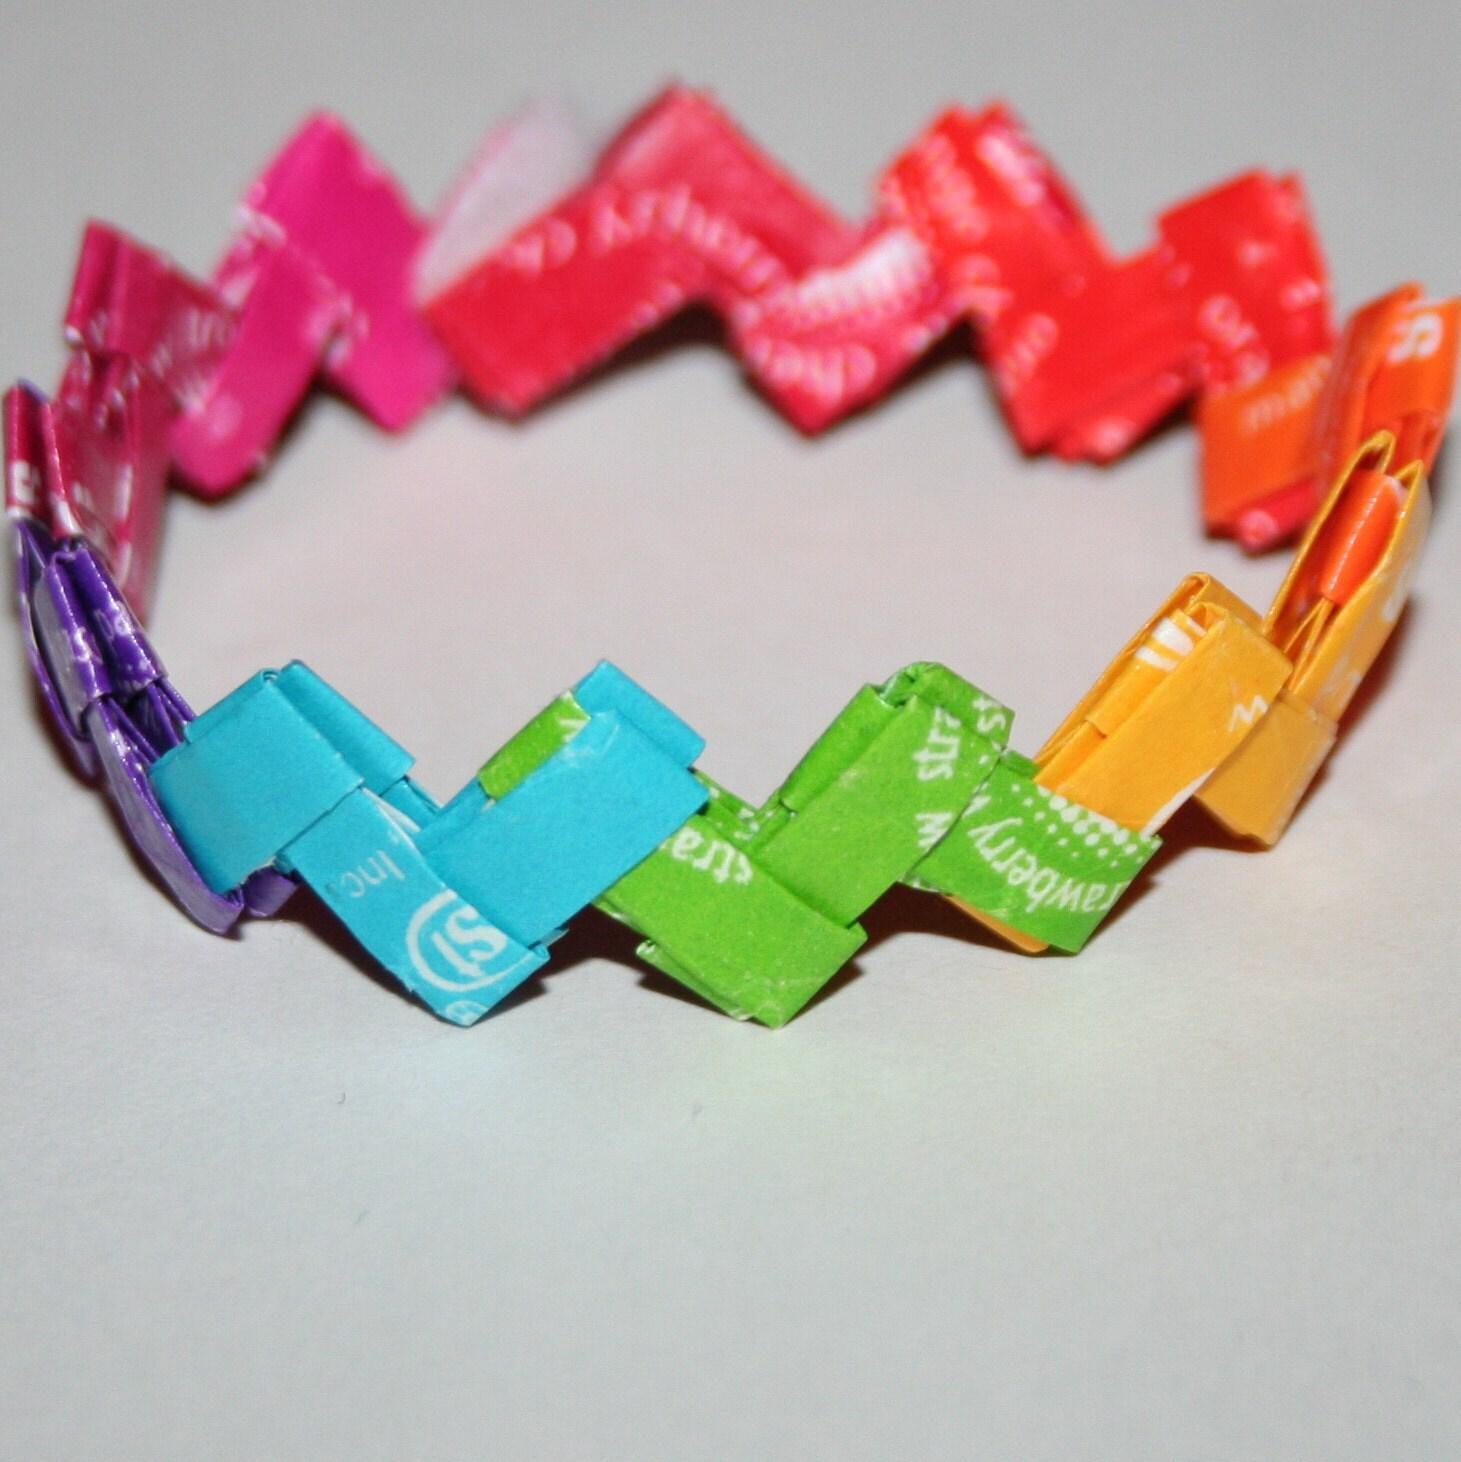 rainbow starburst bracelet by eclectickel on etsy